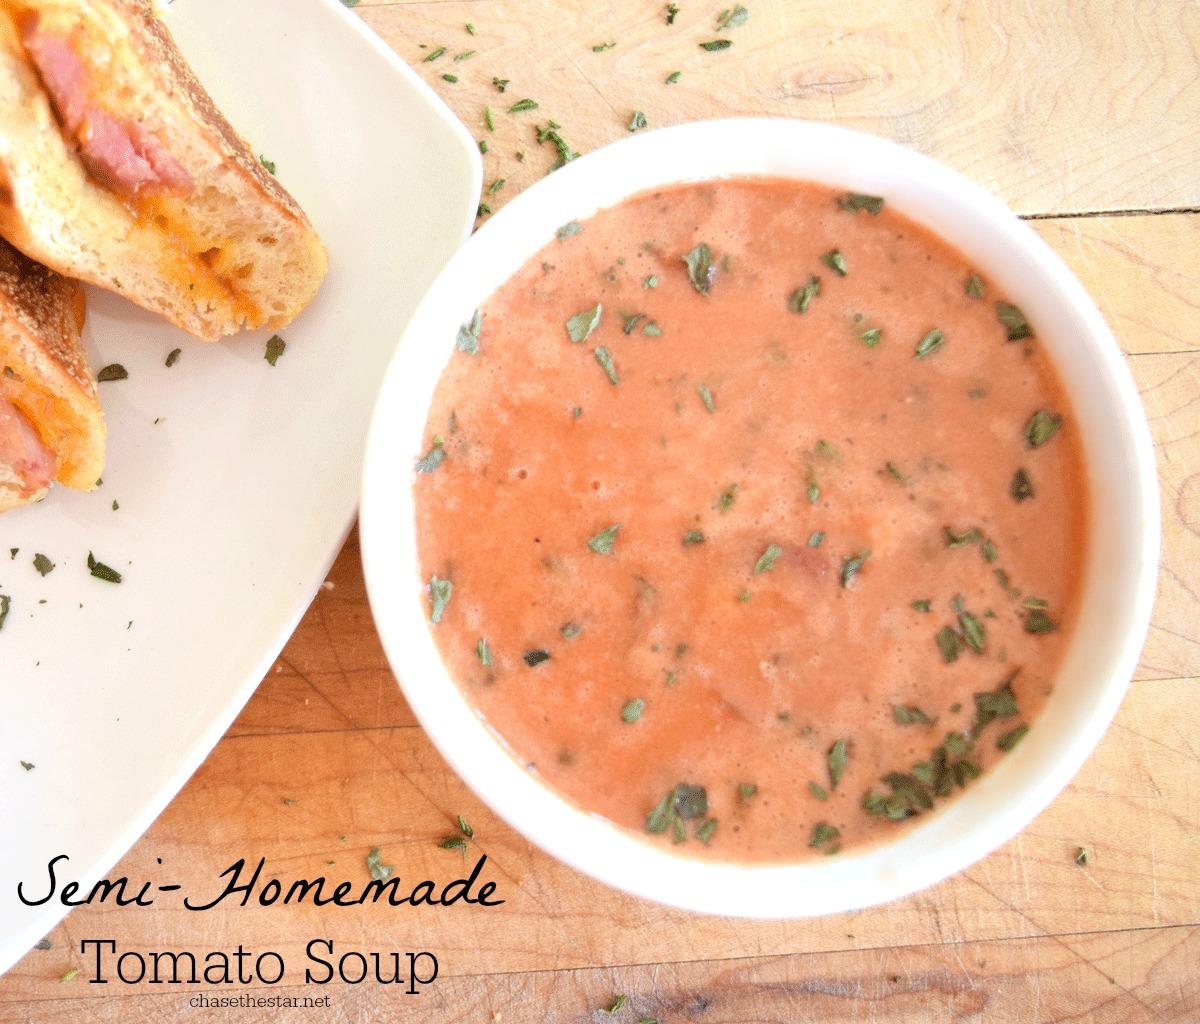 Semi-Homemade-Tomato-Soup-chasethestar_net-recipe-comfortfood-tomatosoup